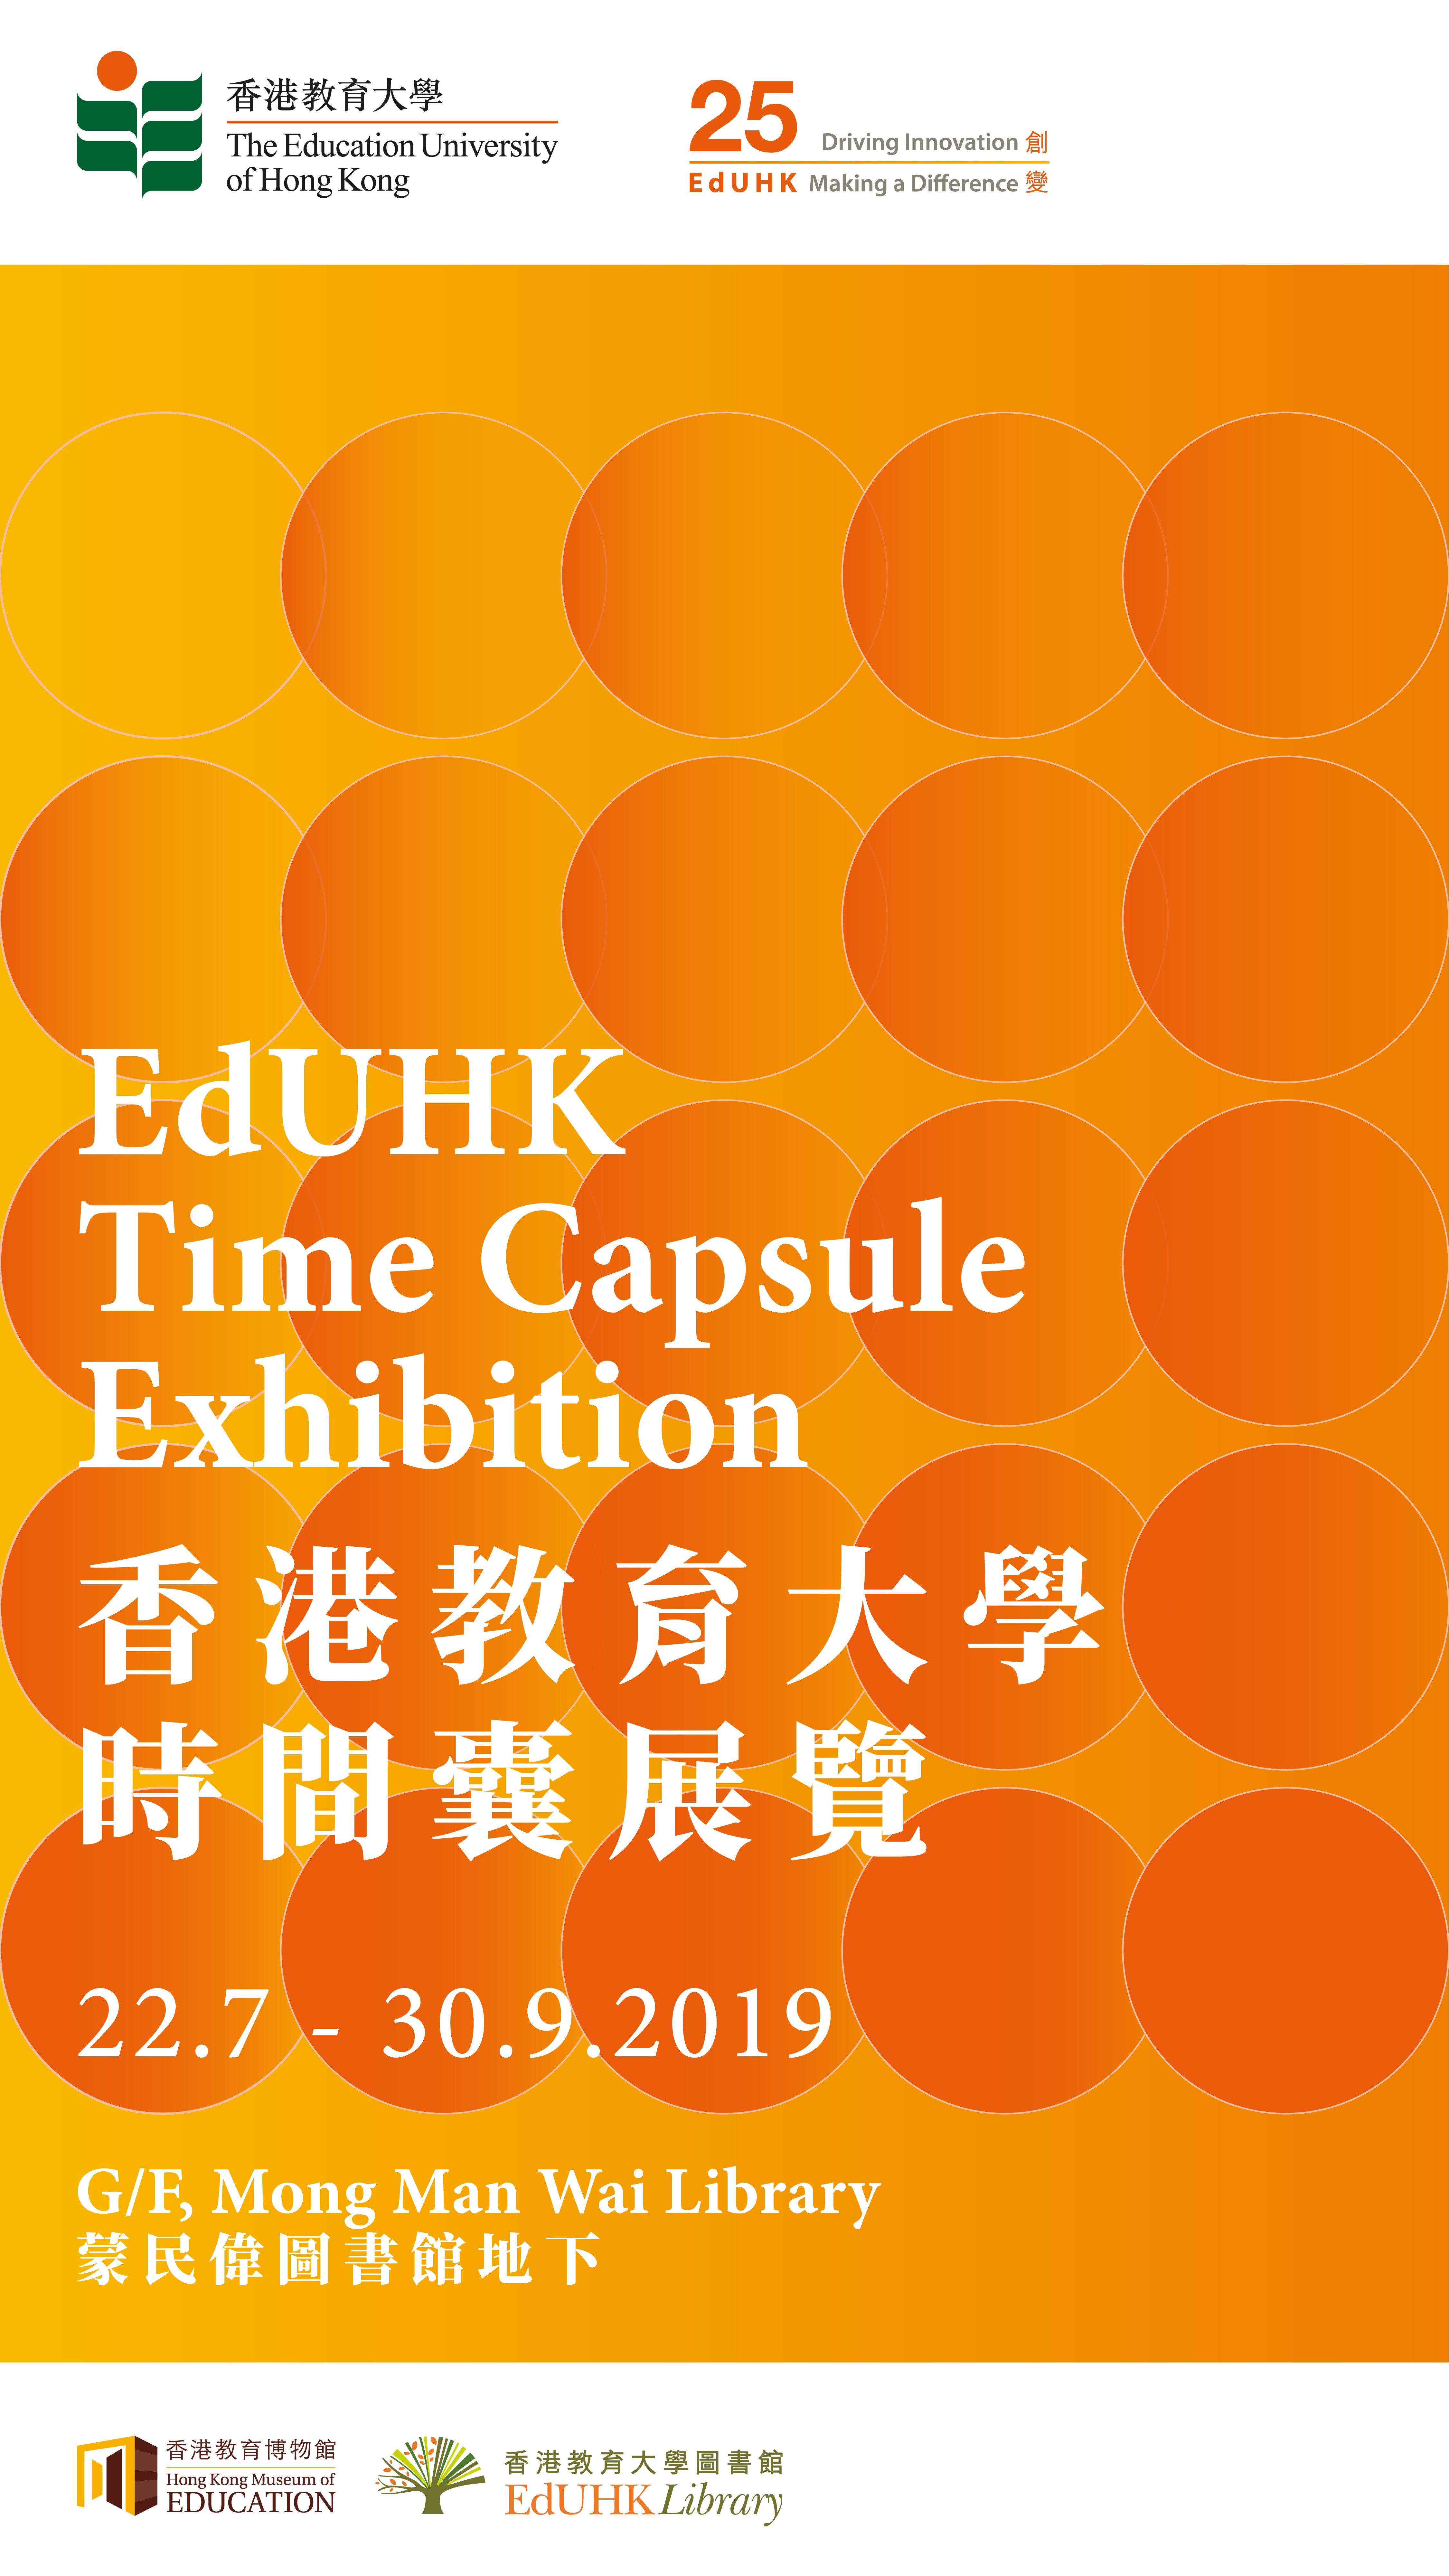 EdUHK, Time Capsule, Exhibition